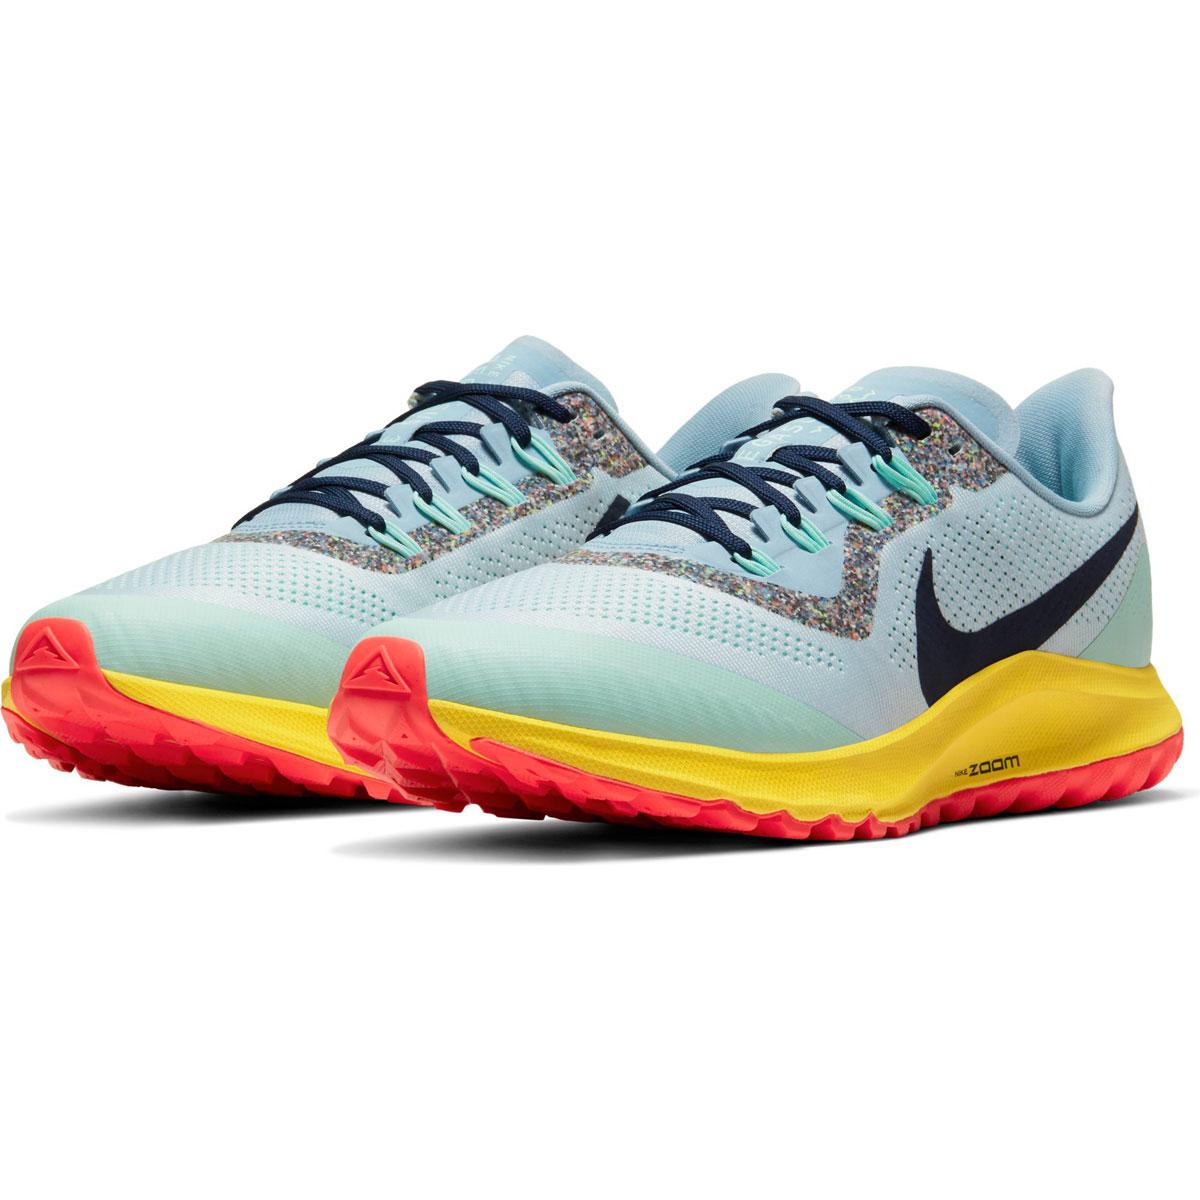 Men's Nike Air Zoom Pegasus 36 Trail Running Shoe - Color: Aura/Blackened Blue/Light Armory (Regular Width) - Size: 6, Aura/Blackened Blue/Light Armory, large, image 4